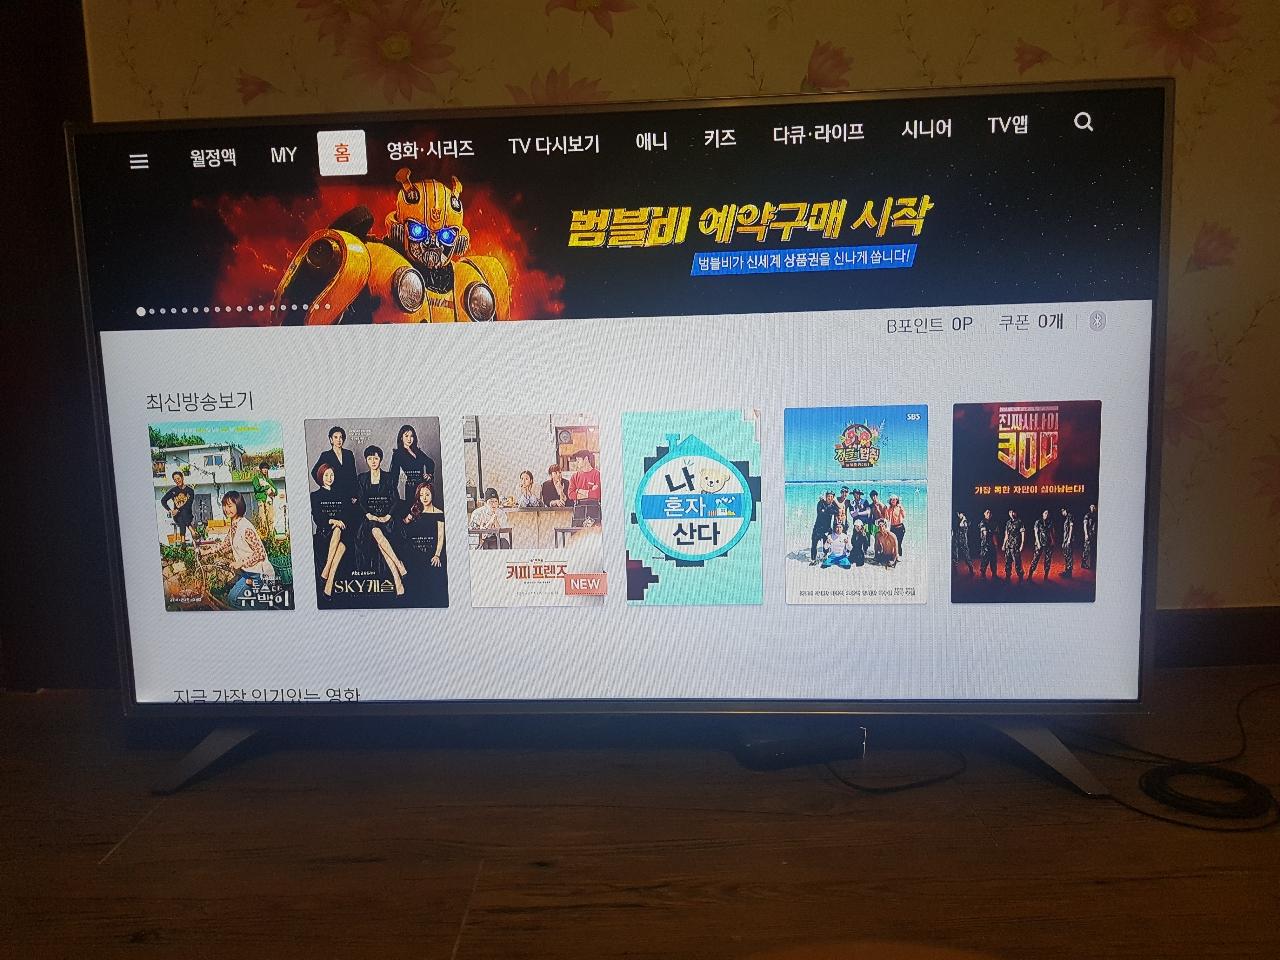 LG55인치 TV